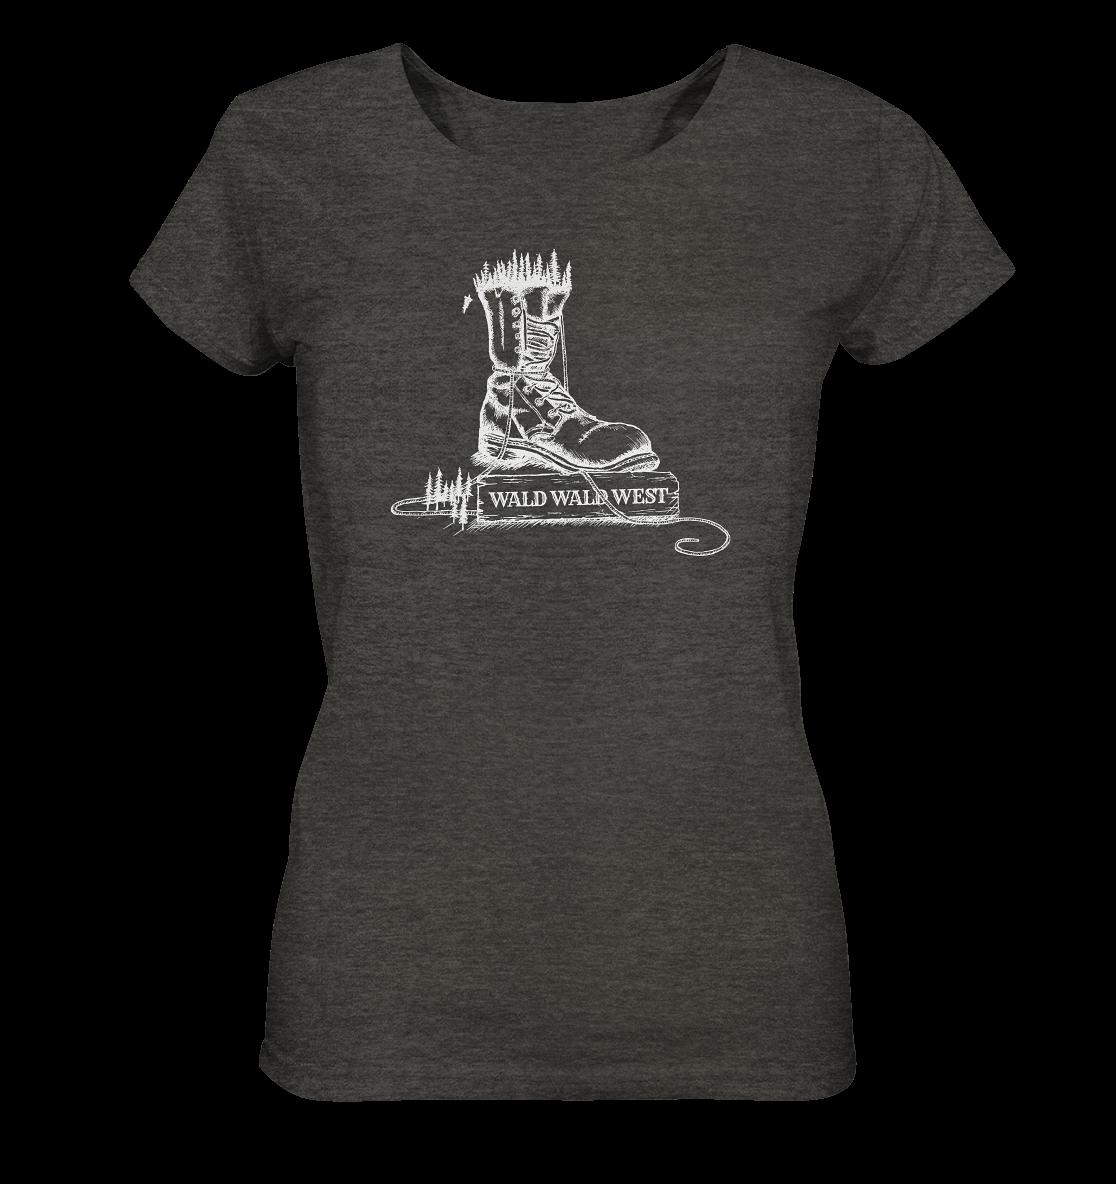 front-ladies-organic-shirt-meliert-252625-1116x.png